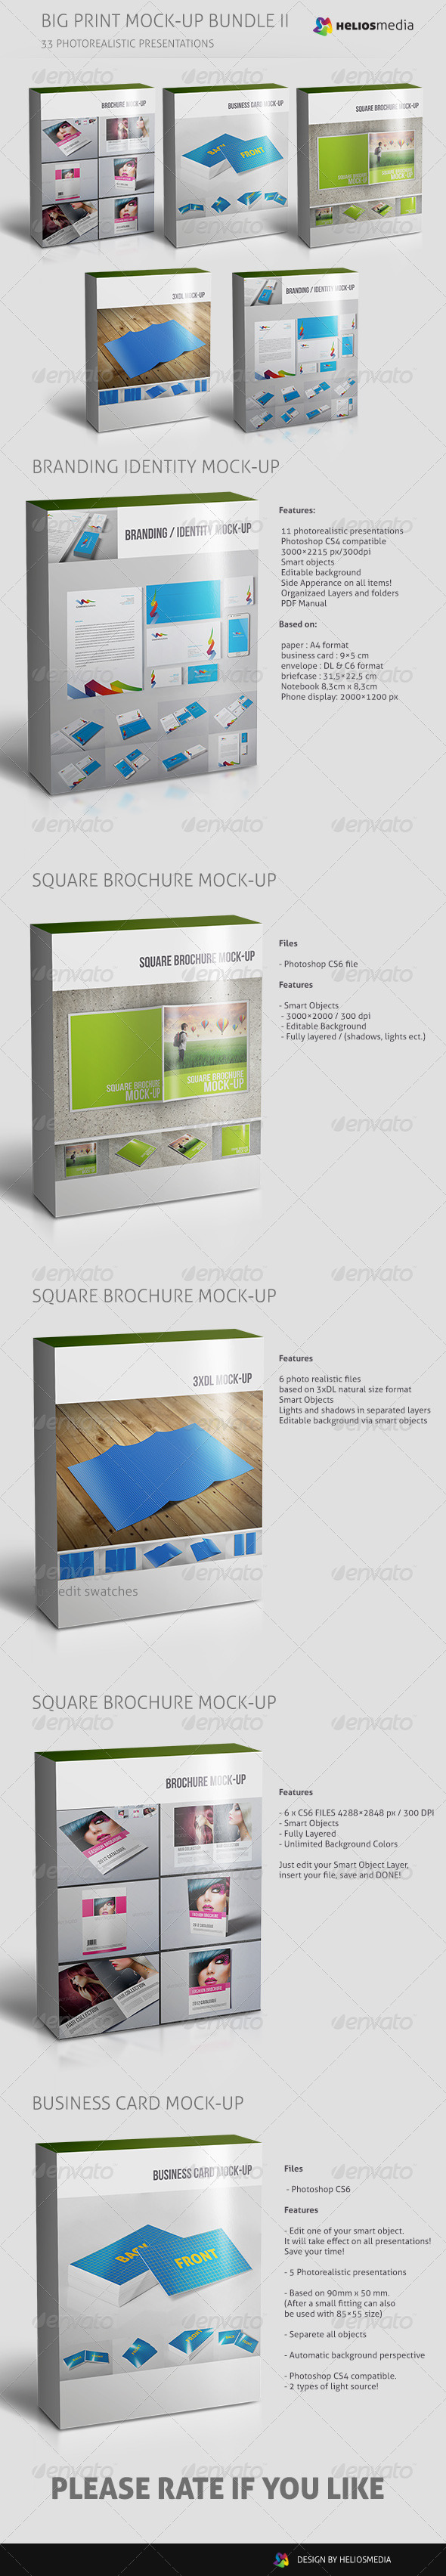 GraphicRiver Big Print Mock-up Bundle II 5128578